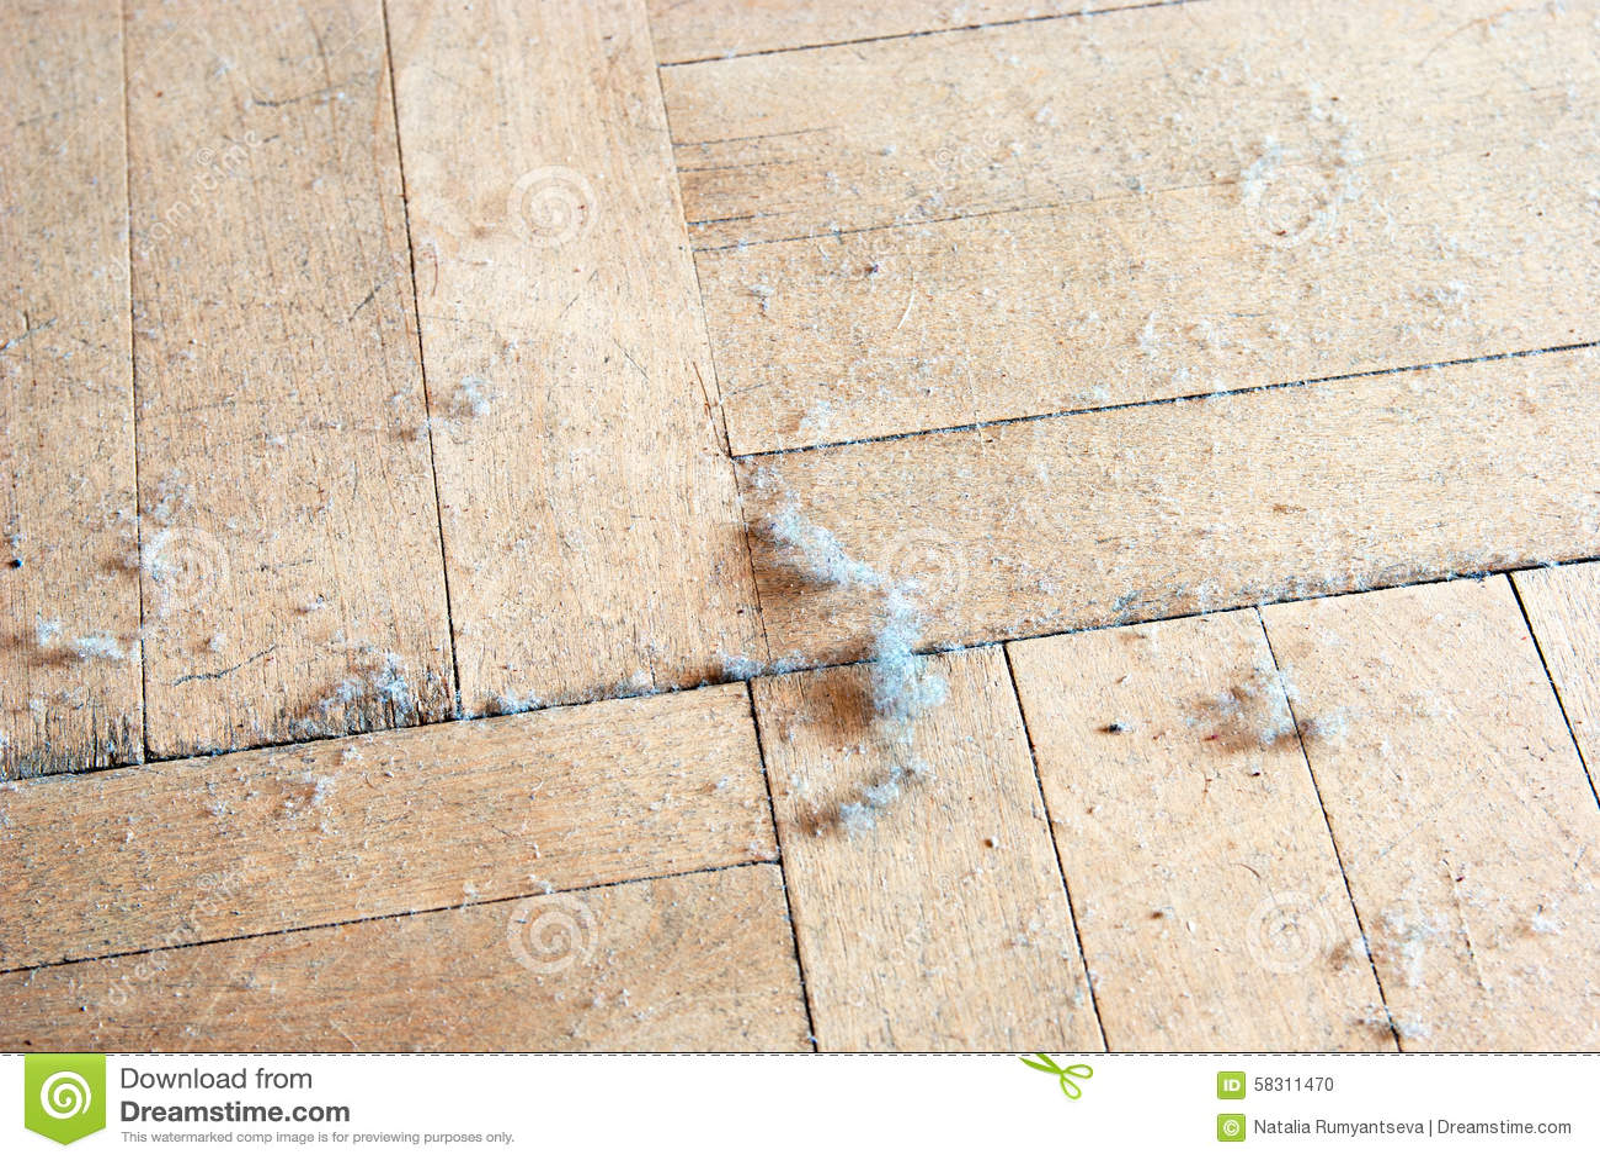 Dust On The Floor Stock Photo Image 58311470